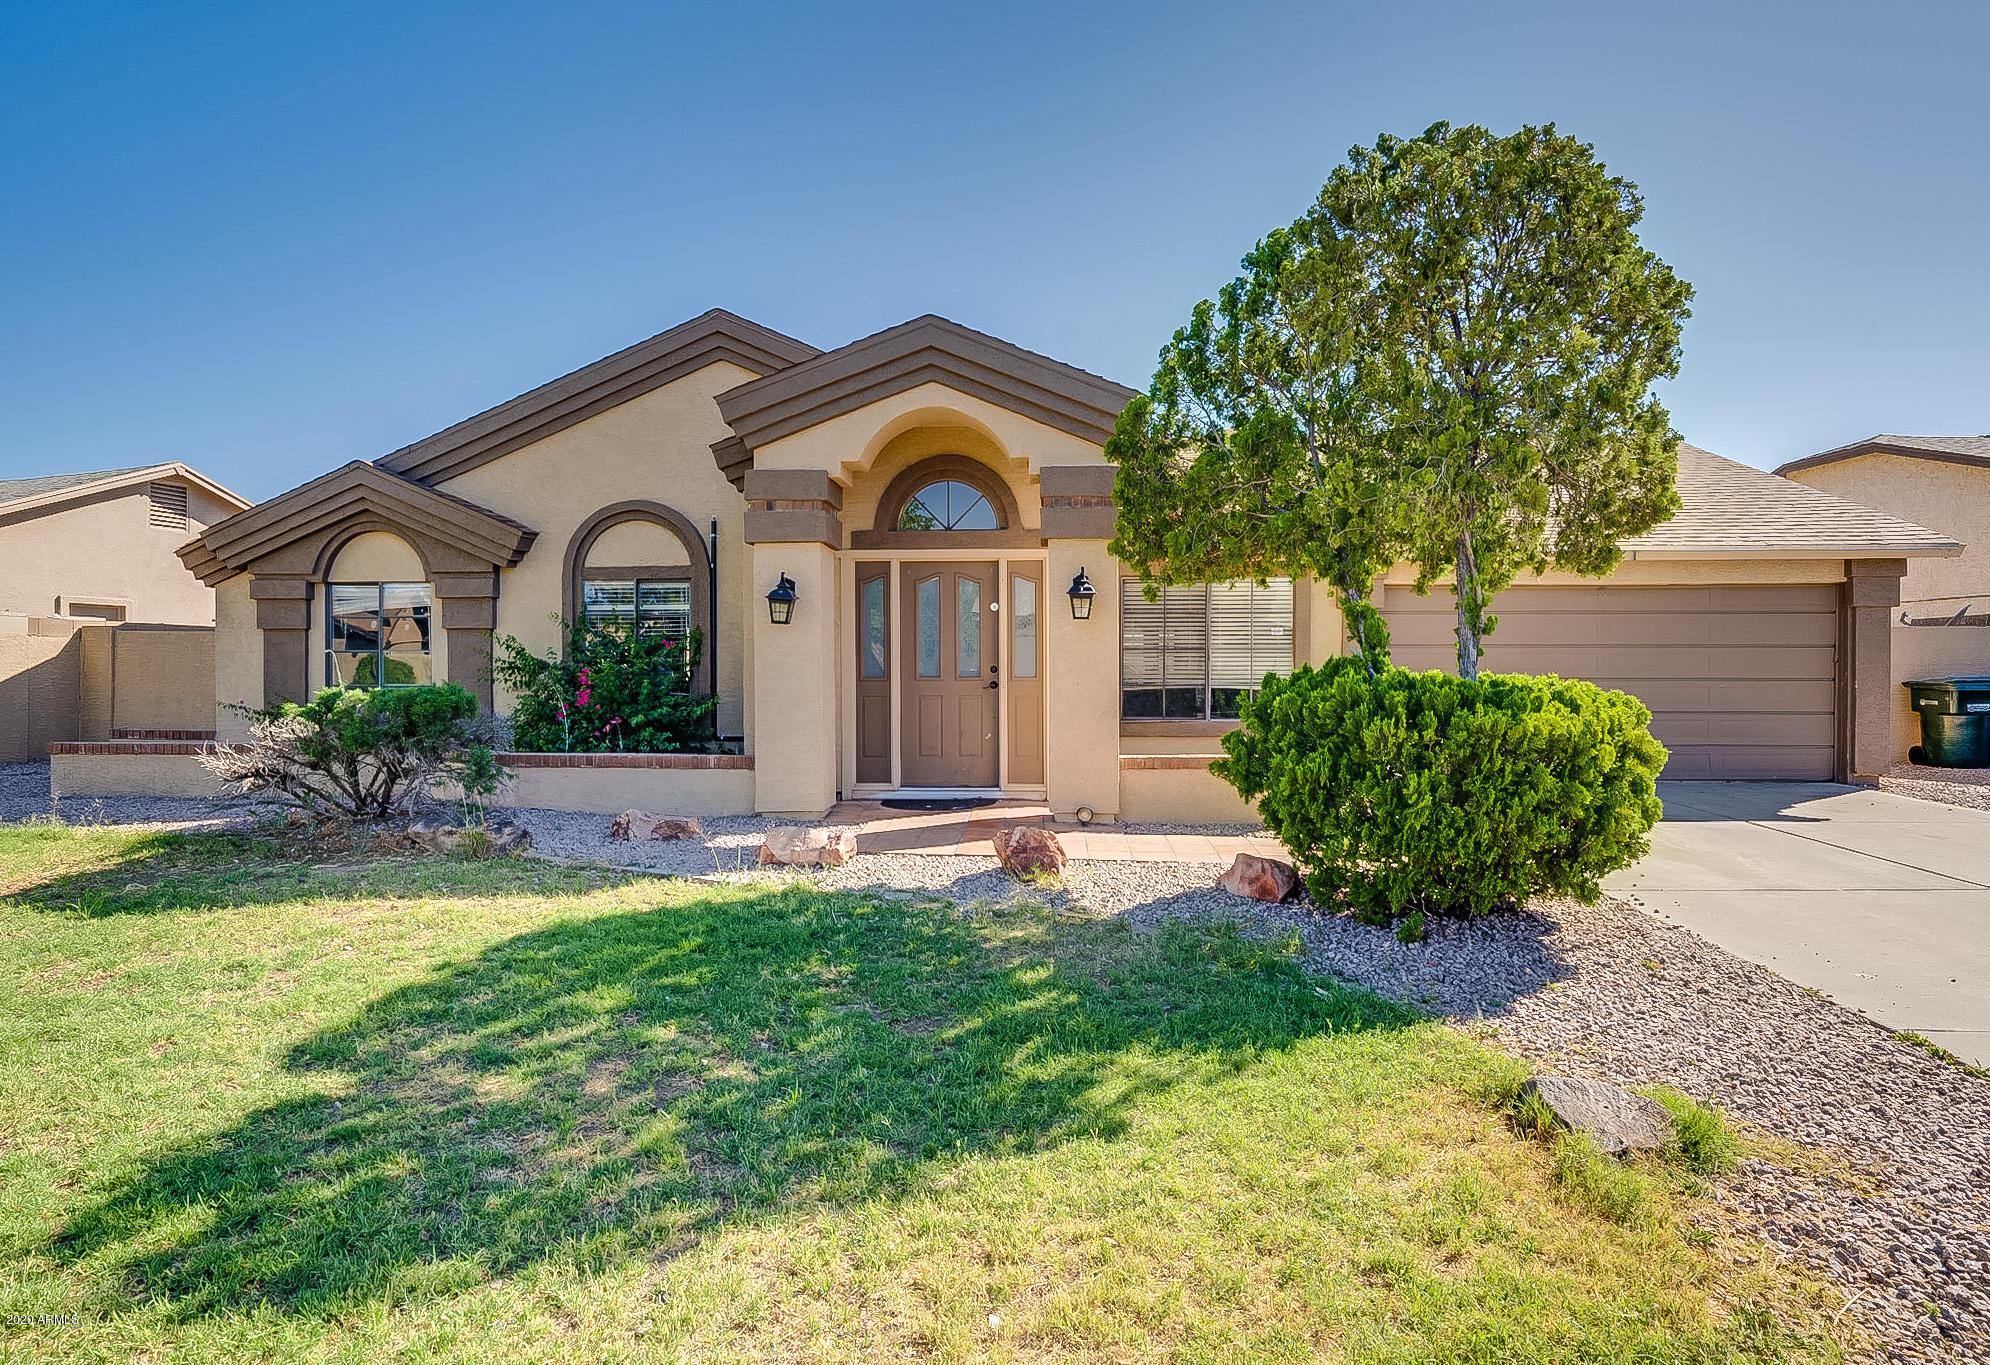 Photo of 6721 W CRITTENDEN Lane, Phoenix, AZ 85033